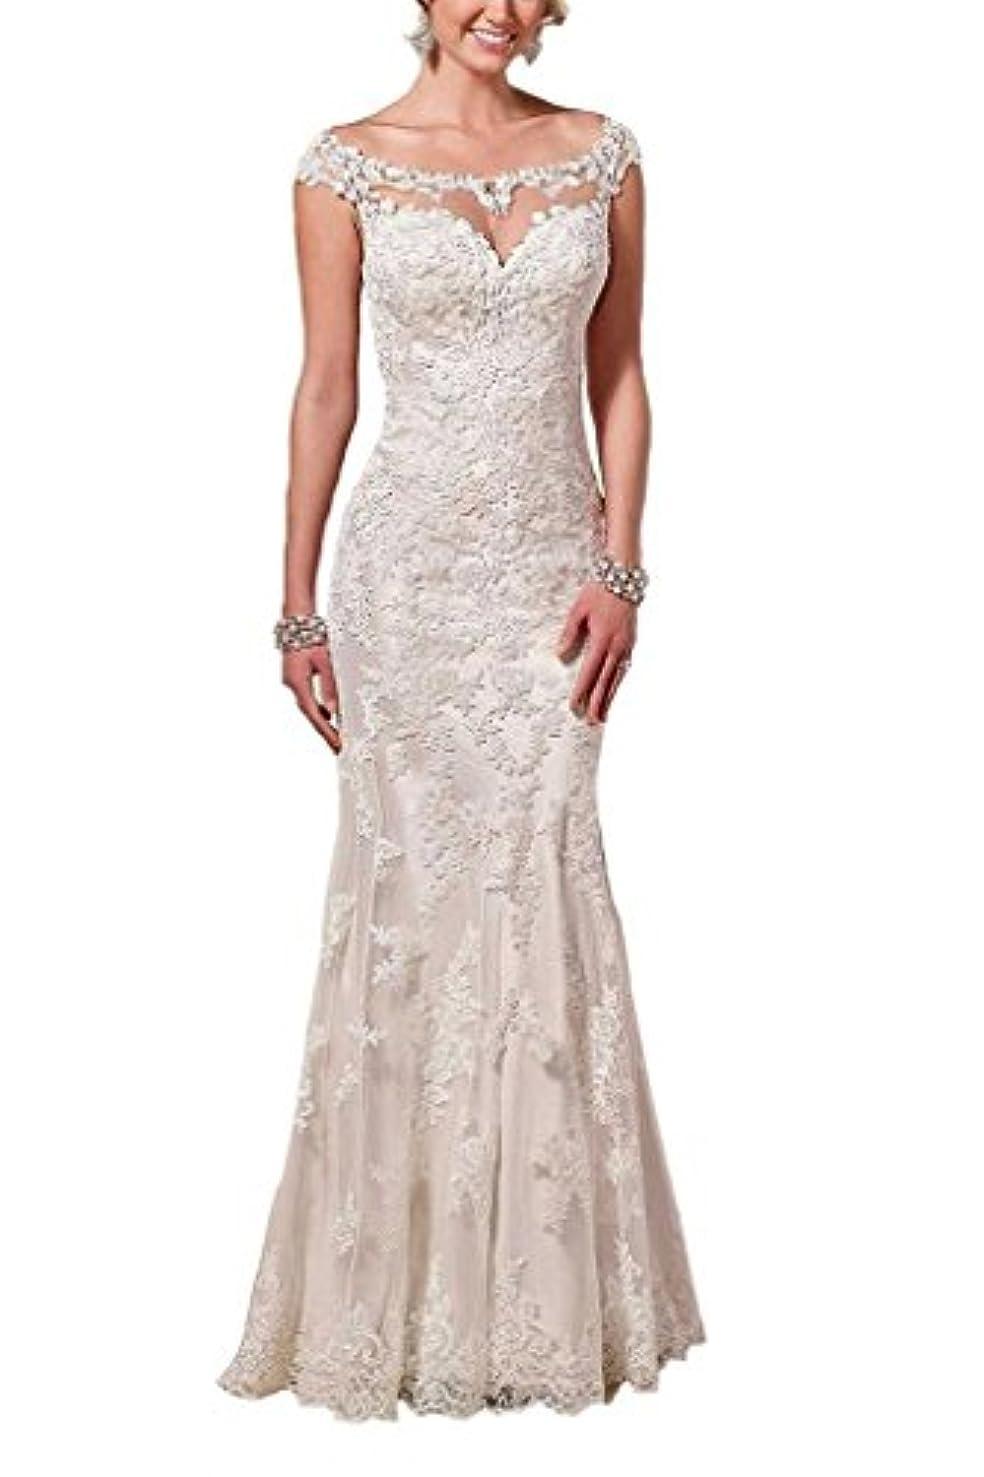 Firose Lace Wedding Dresses Satin Sheath Illusion Neckline Mermaid for Bride 2019